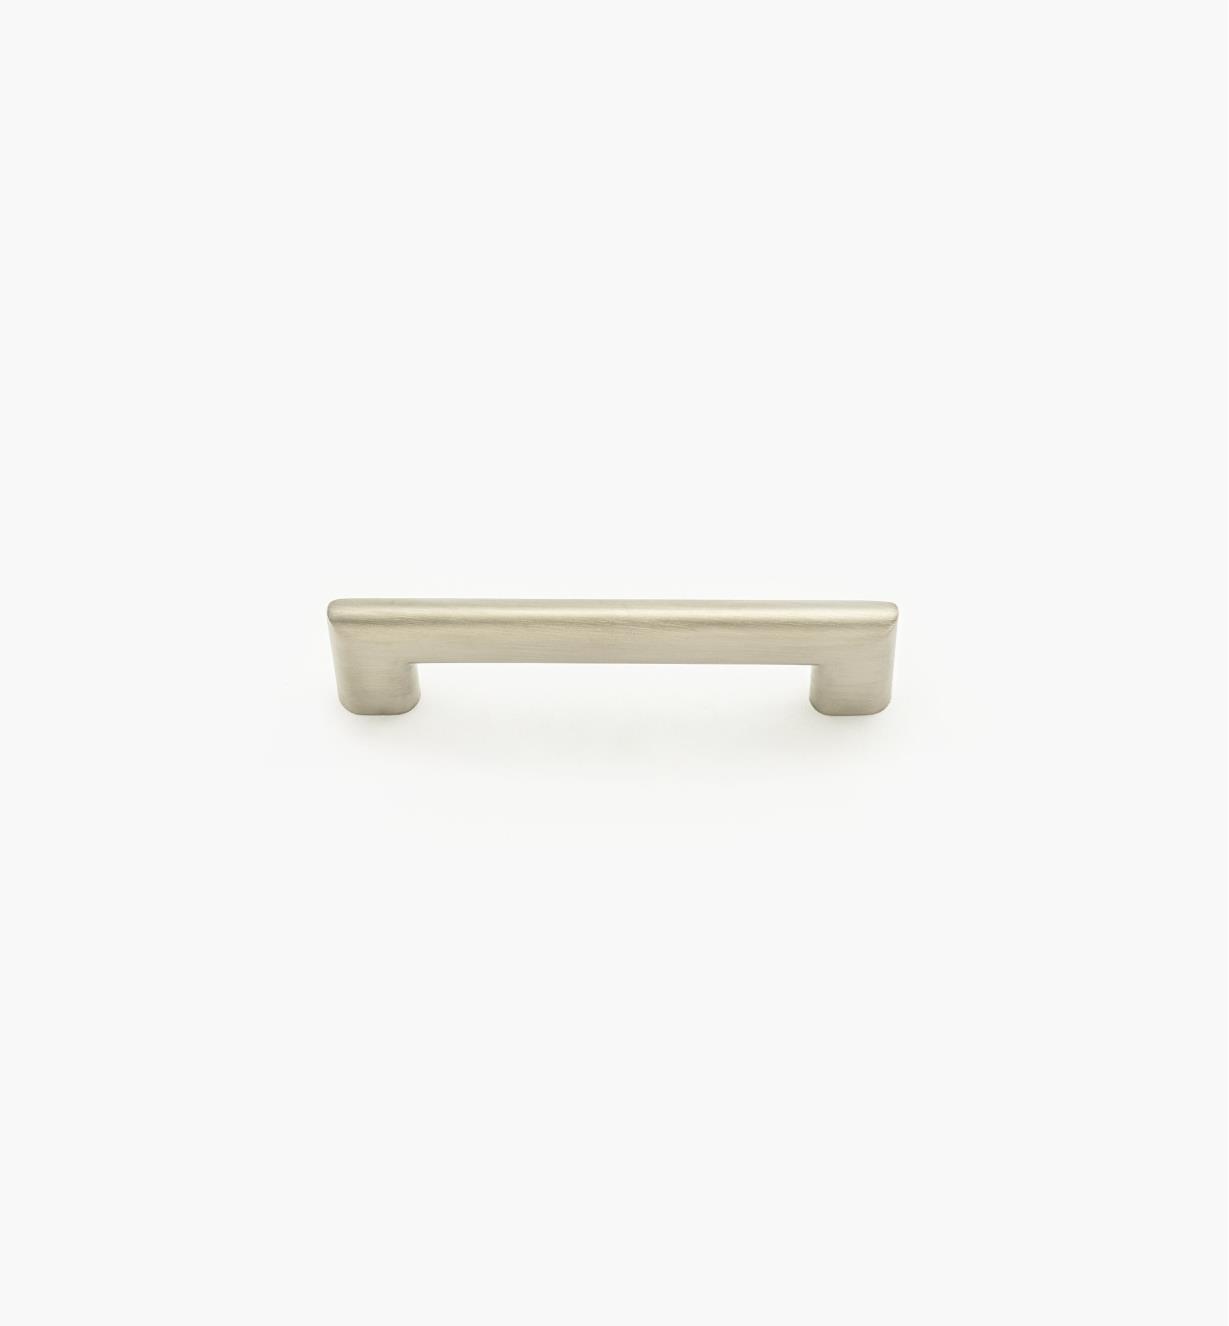 01W8022 - Poignée tubulaire ovale, 128mm